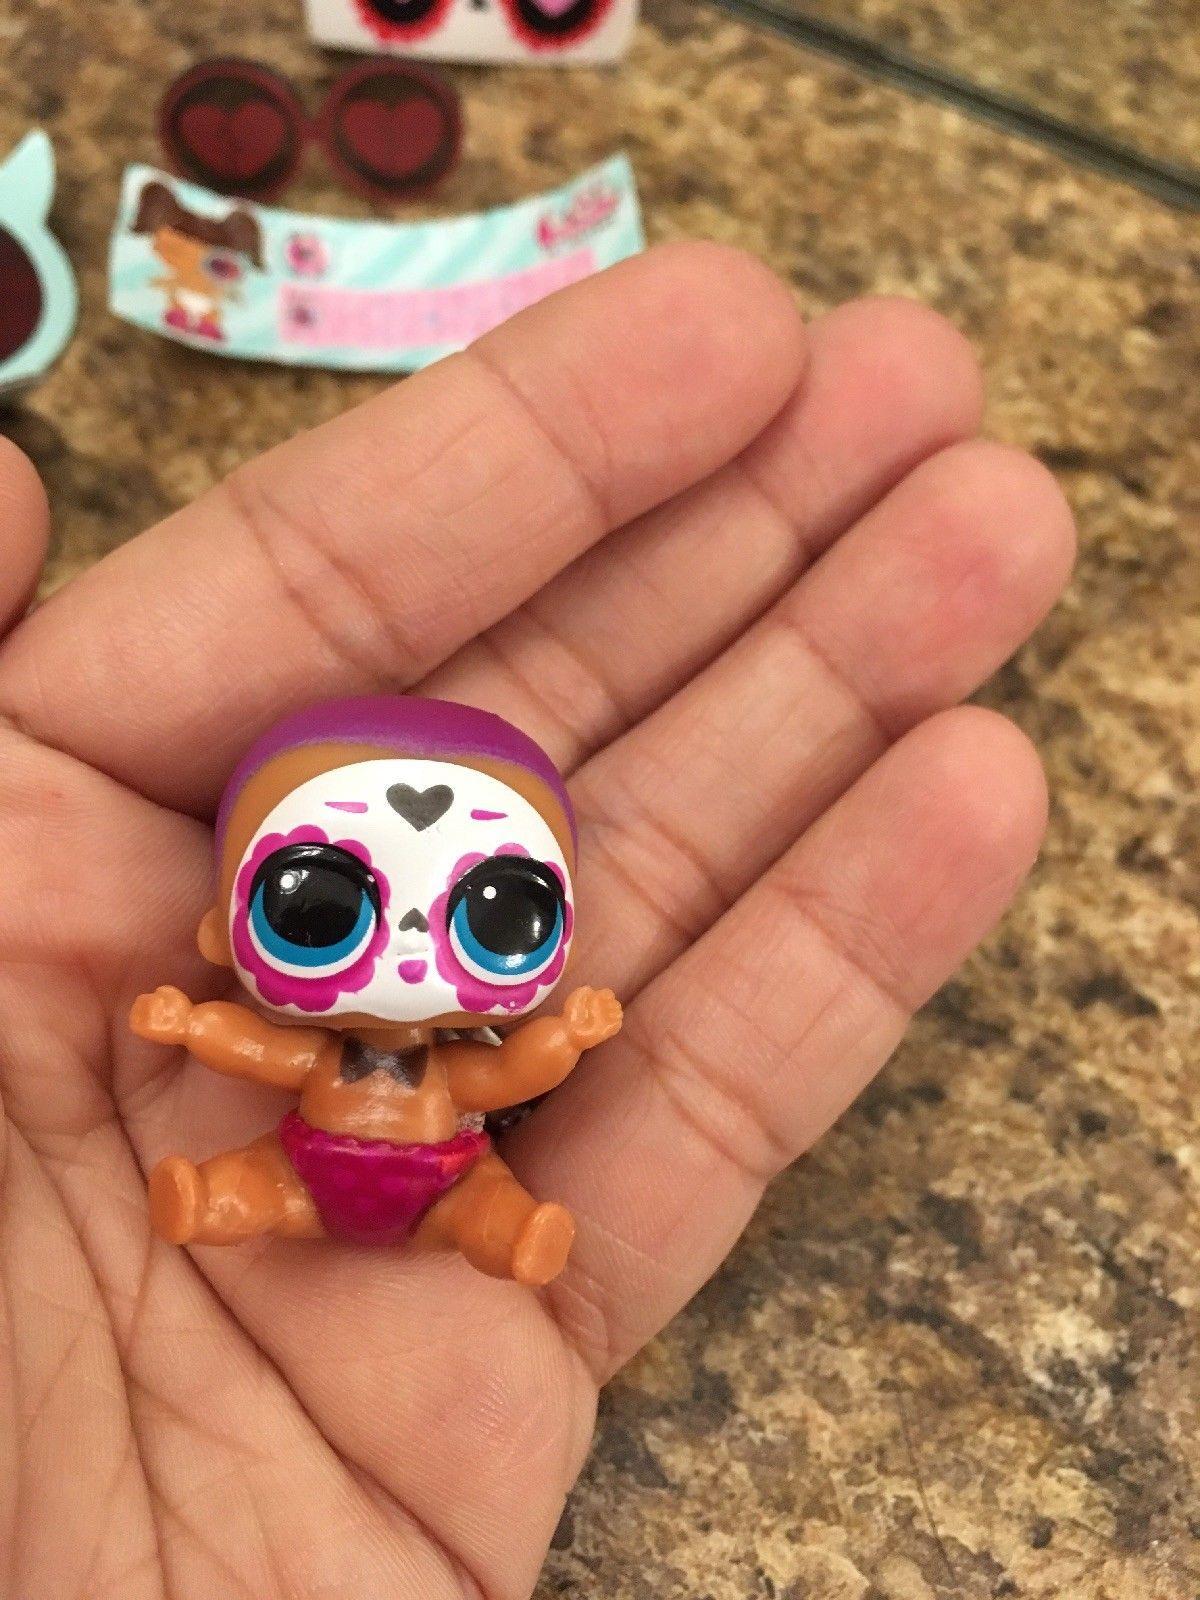 Lol surprise doll Eye spy series RARE bebe bonito